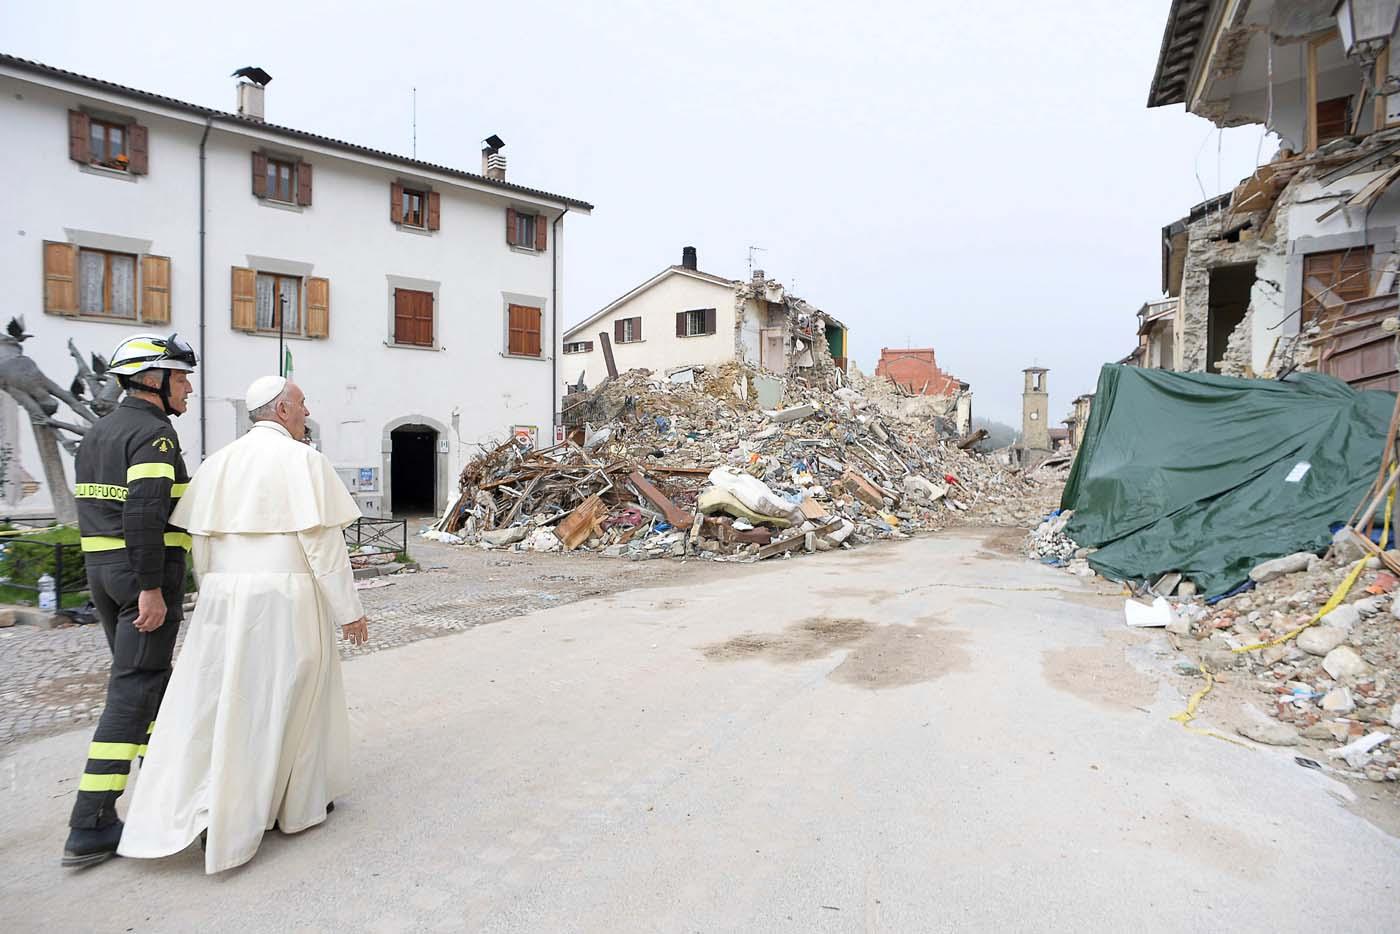 2016-10-04T094930Z_902052095_S1BEUEZYQCAA_RTRMADP_3_ITALY-QUAKE-POPE